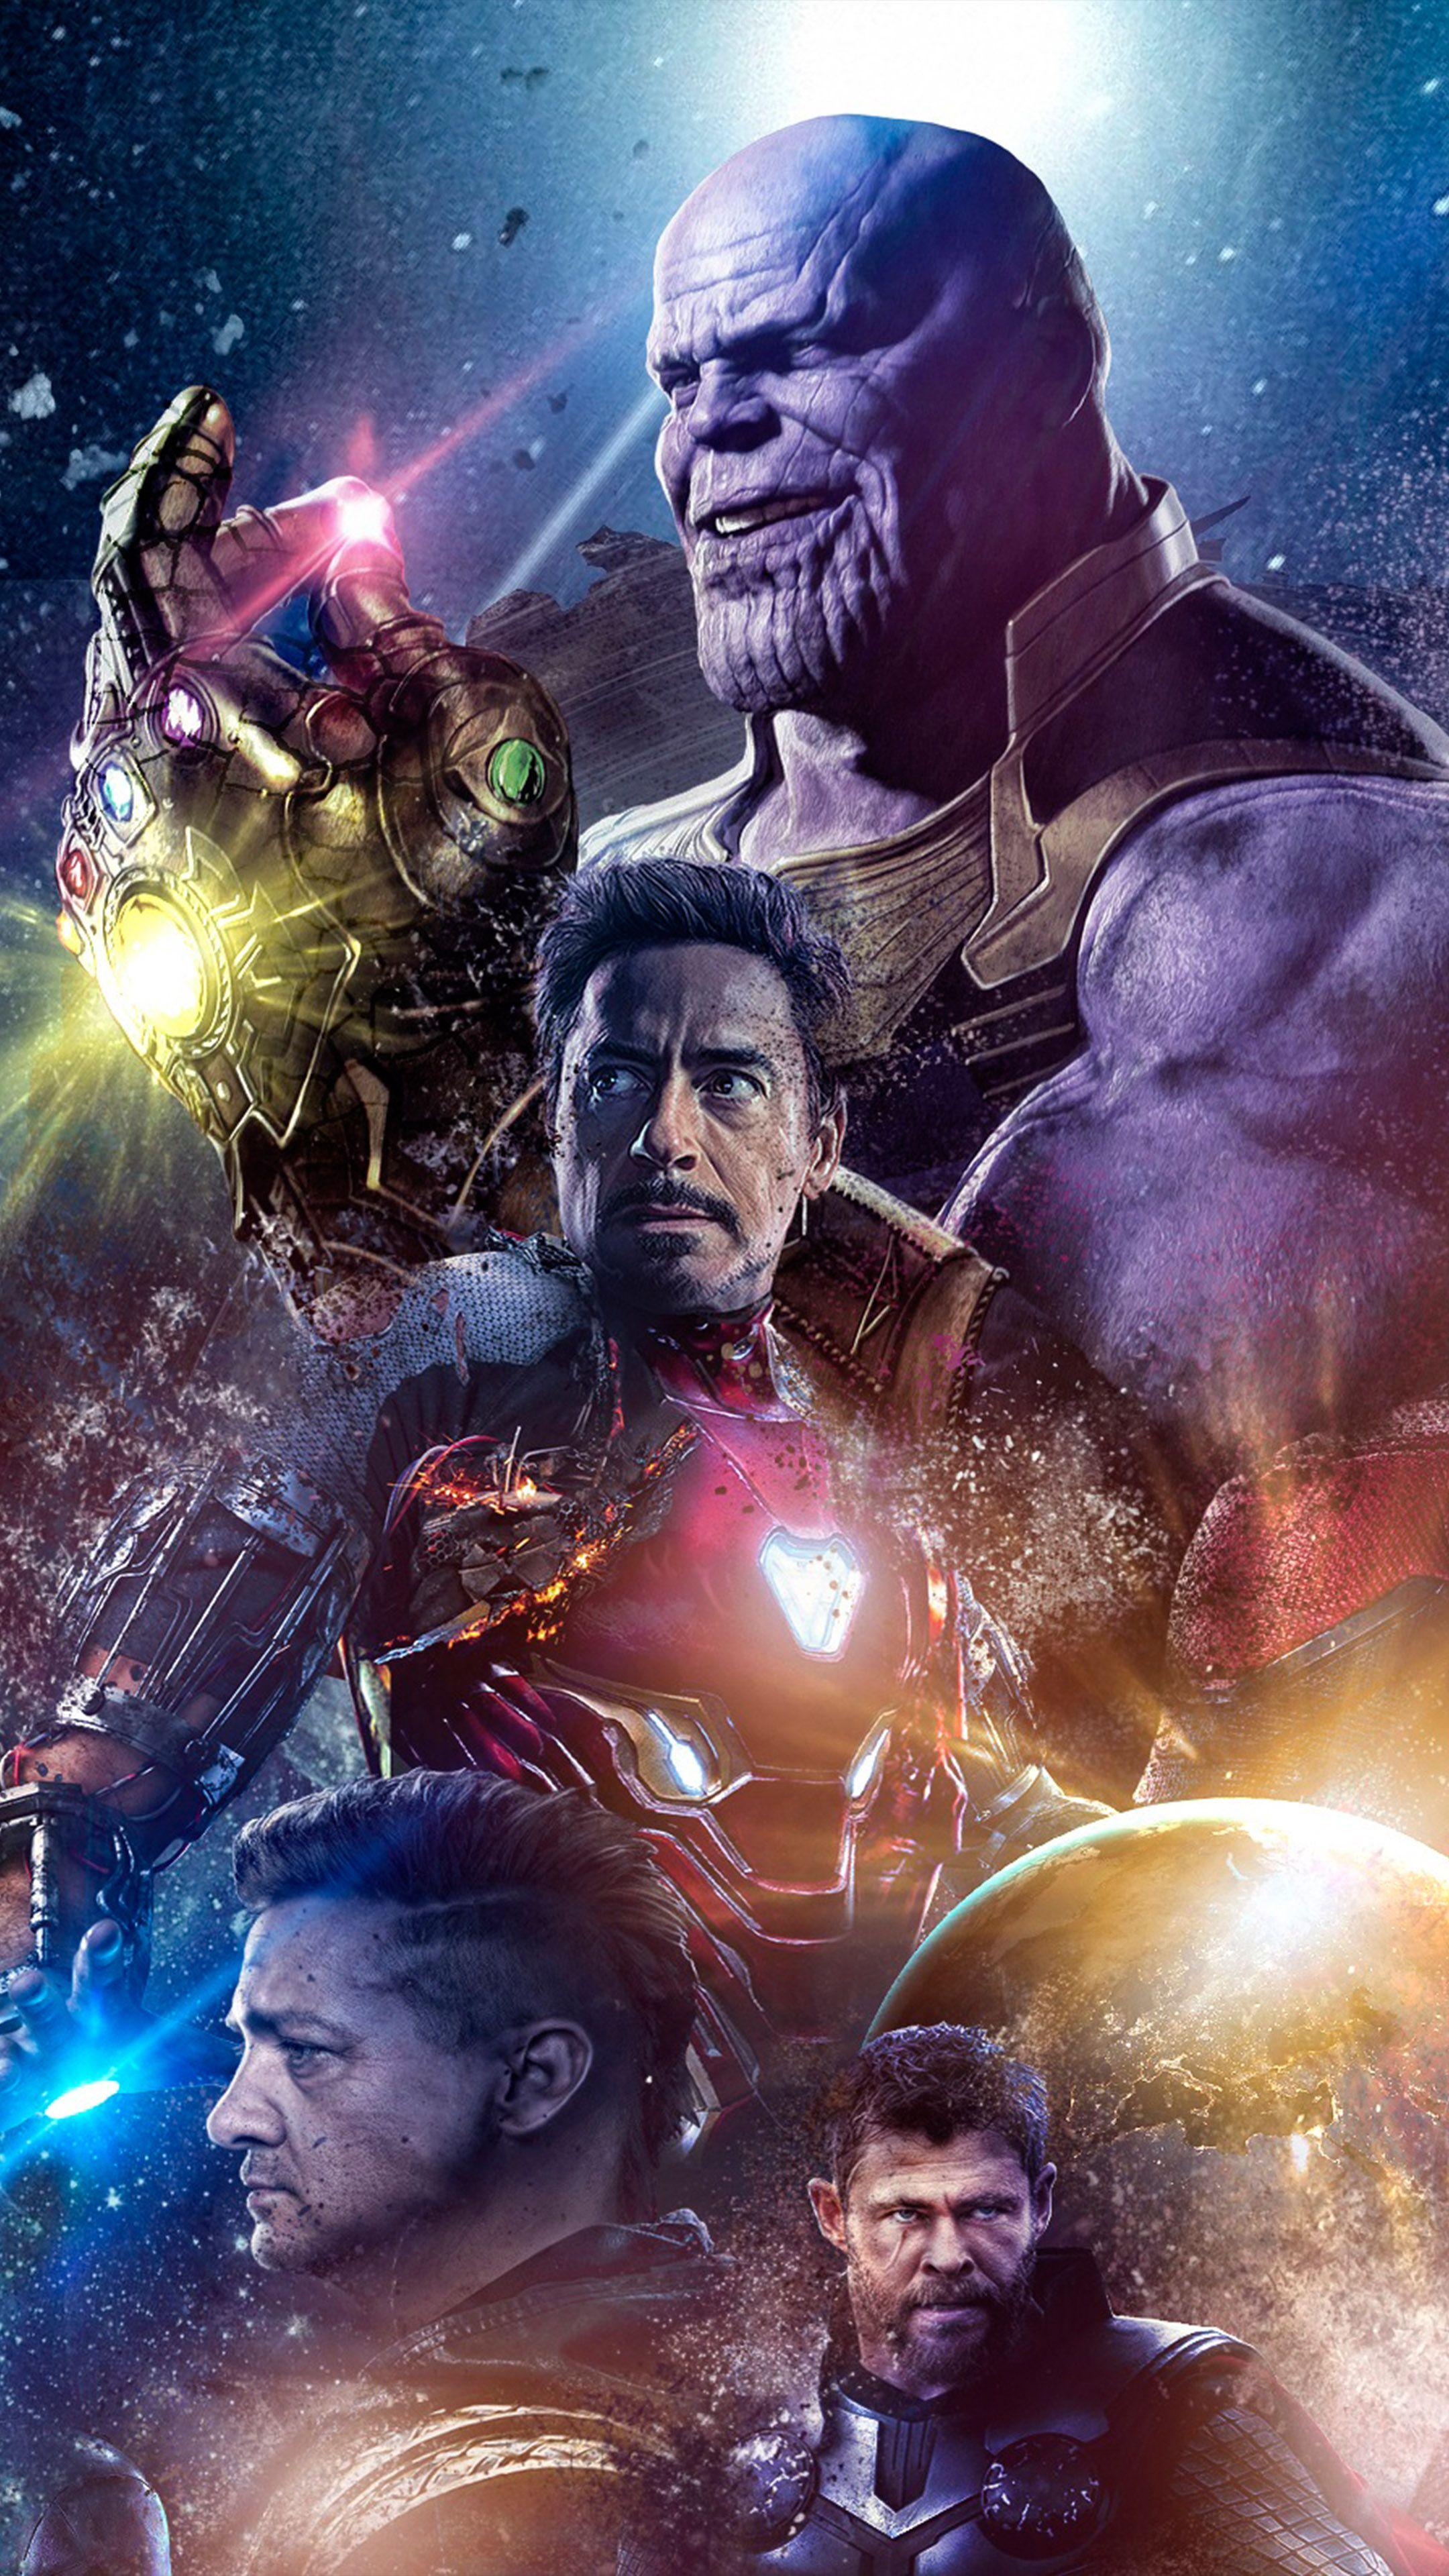 HD Mobile Iron Man Endgame Wallpapers - Wallpaper Cave